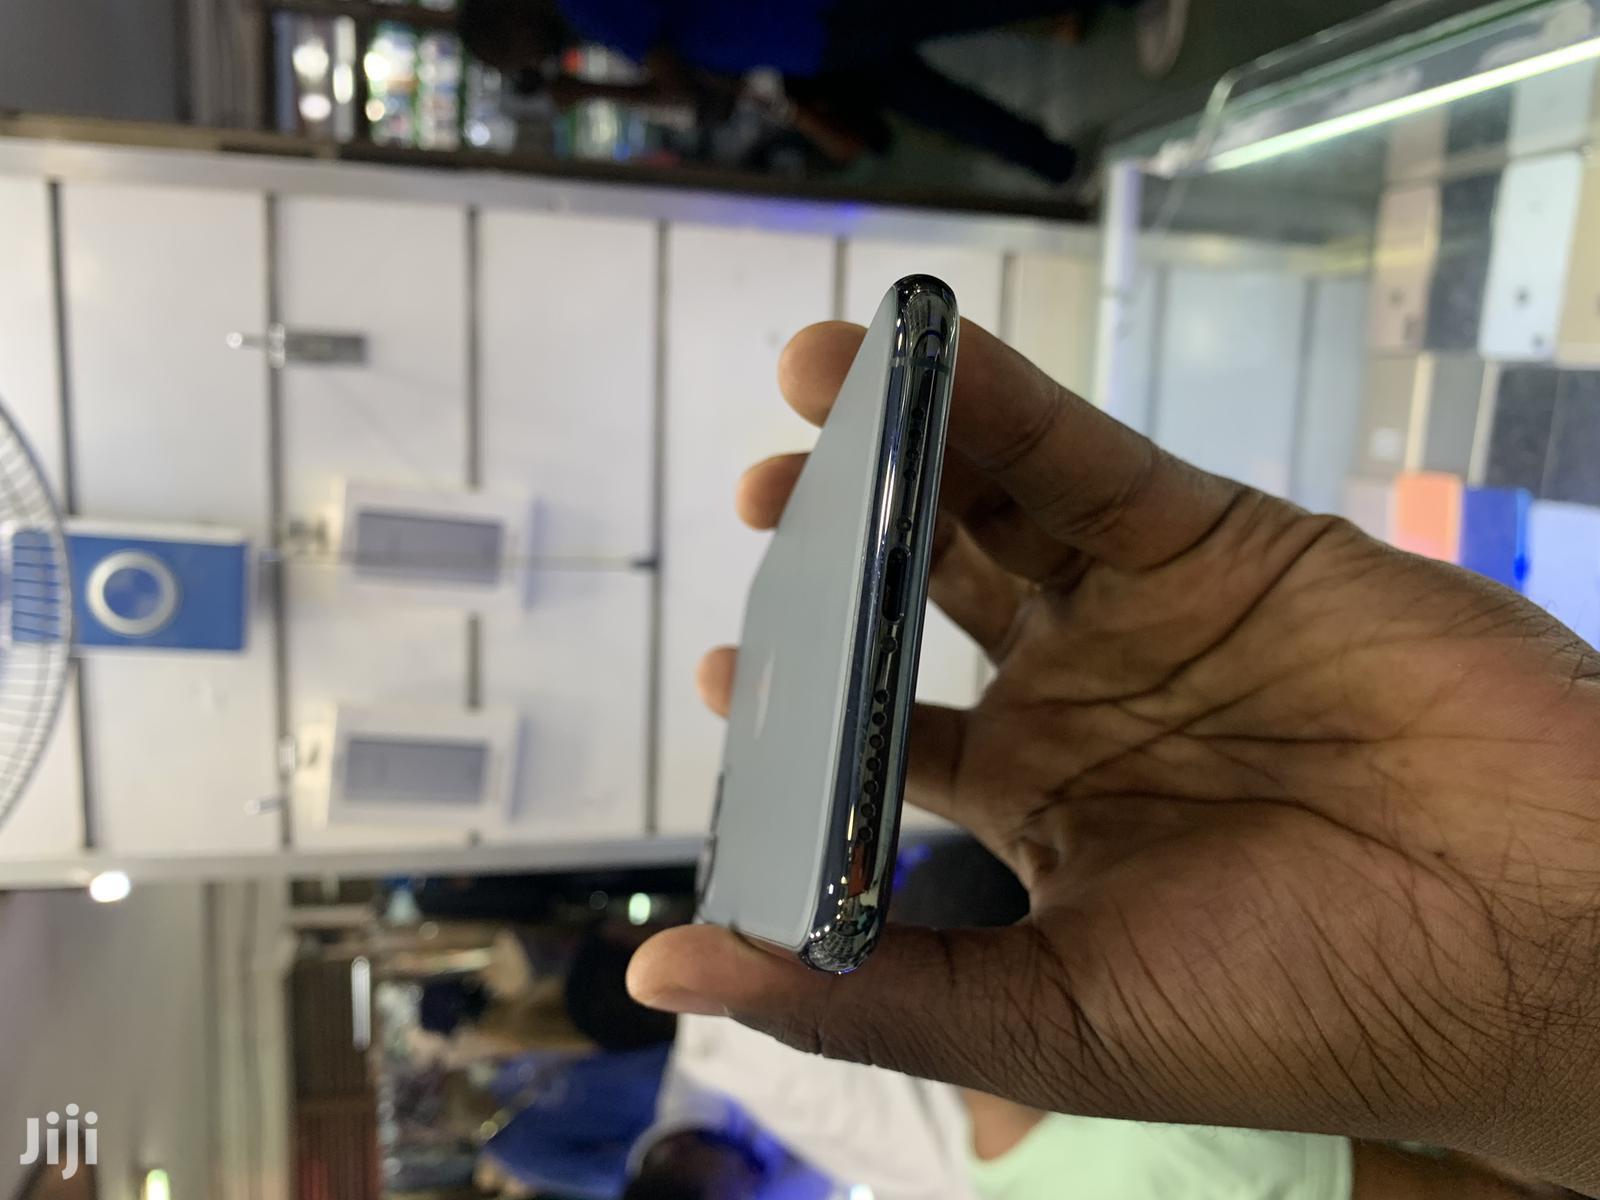 Apple iPhone 11 Pro Max 256 GB Black   Mobile Phones for sale in Kampala, Uganda